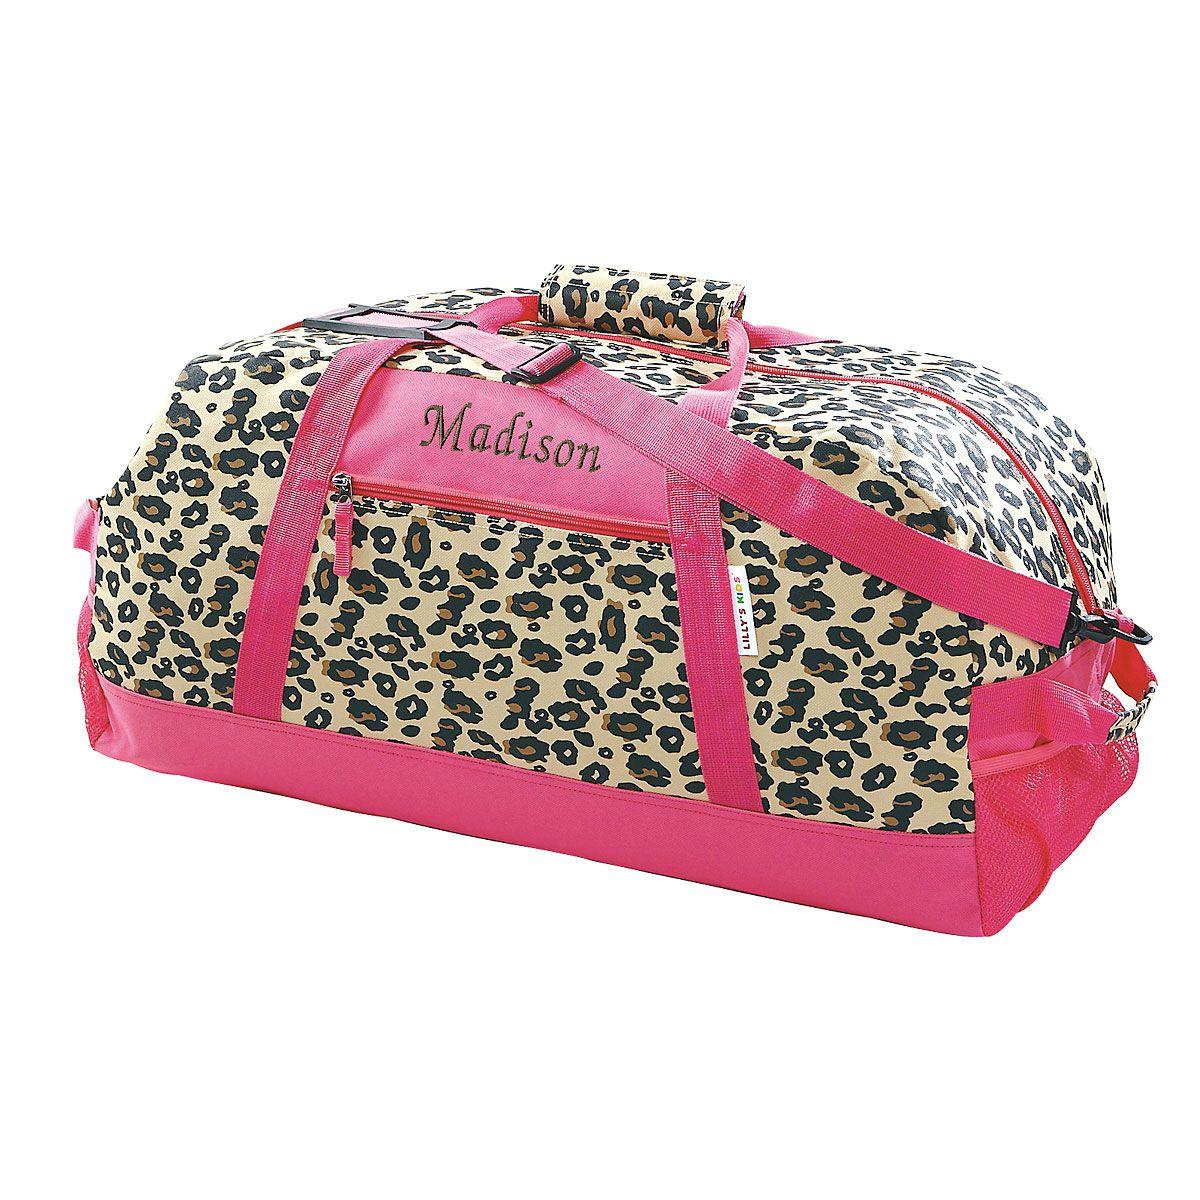 "Leopard Print Personalized 23"" Spots Duffel Bag"